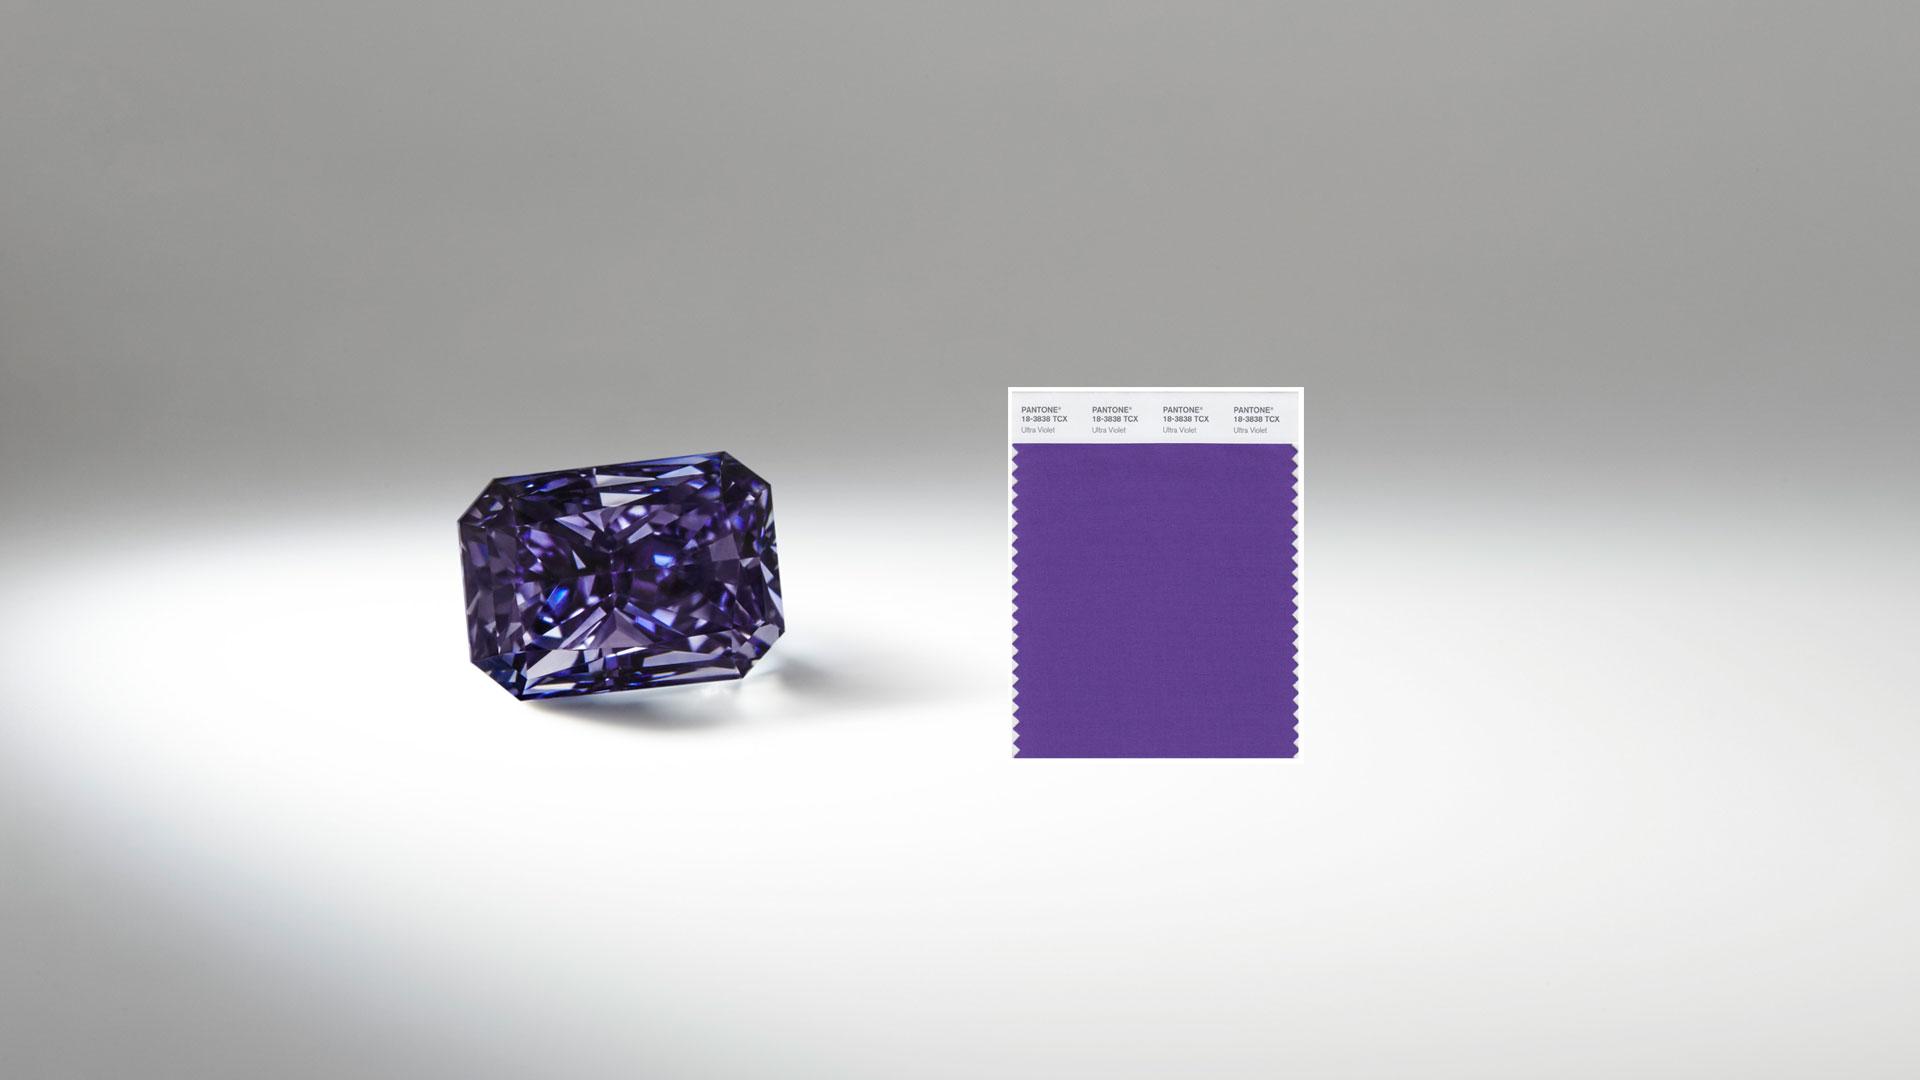 THE ARGYLE LIBERTE: ULTRA VIOLET DIAMOND